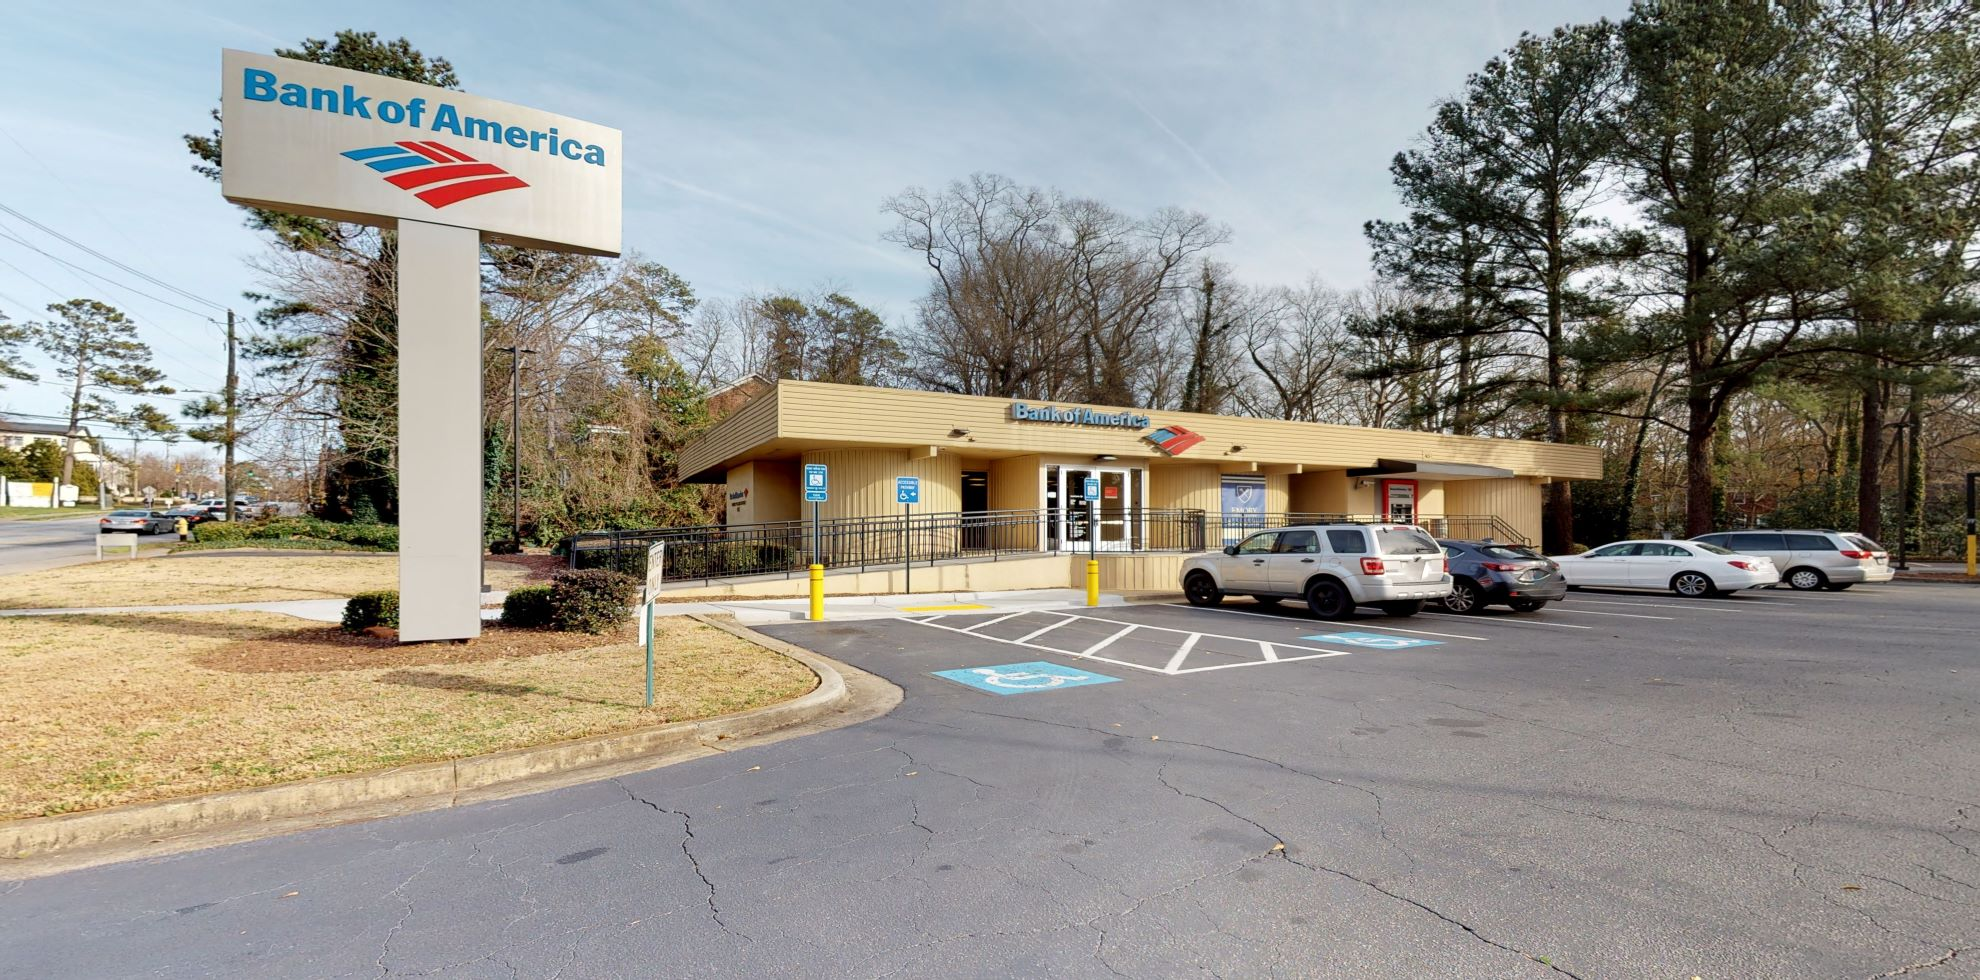 Bank of America financial center with walk-up ATM | 1615 N Decatur Rd NE, Atlanta, GA 30307